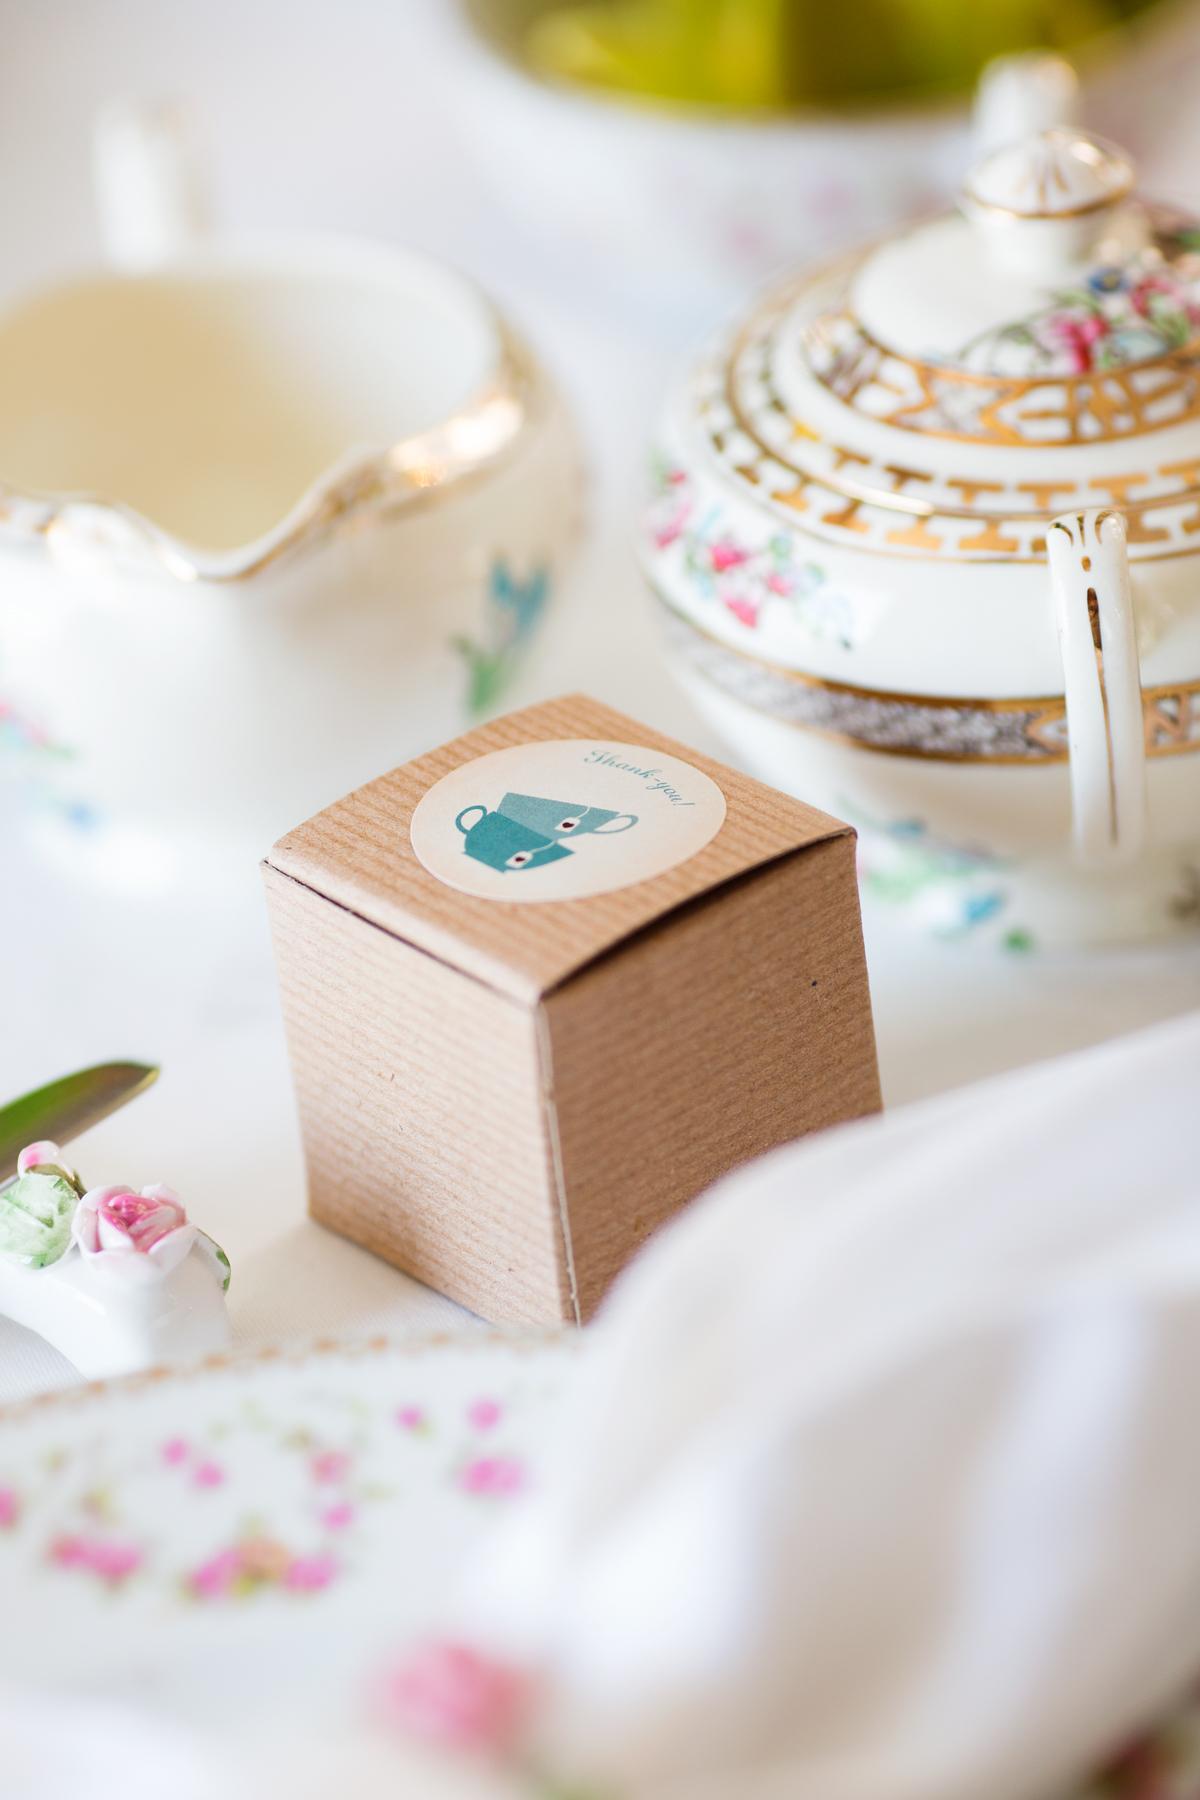 Vintage inspired High Tea and menu by Cravings